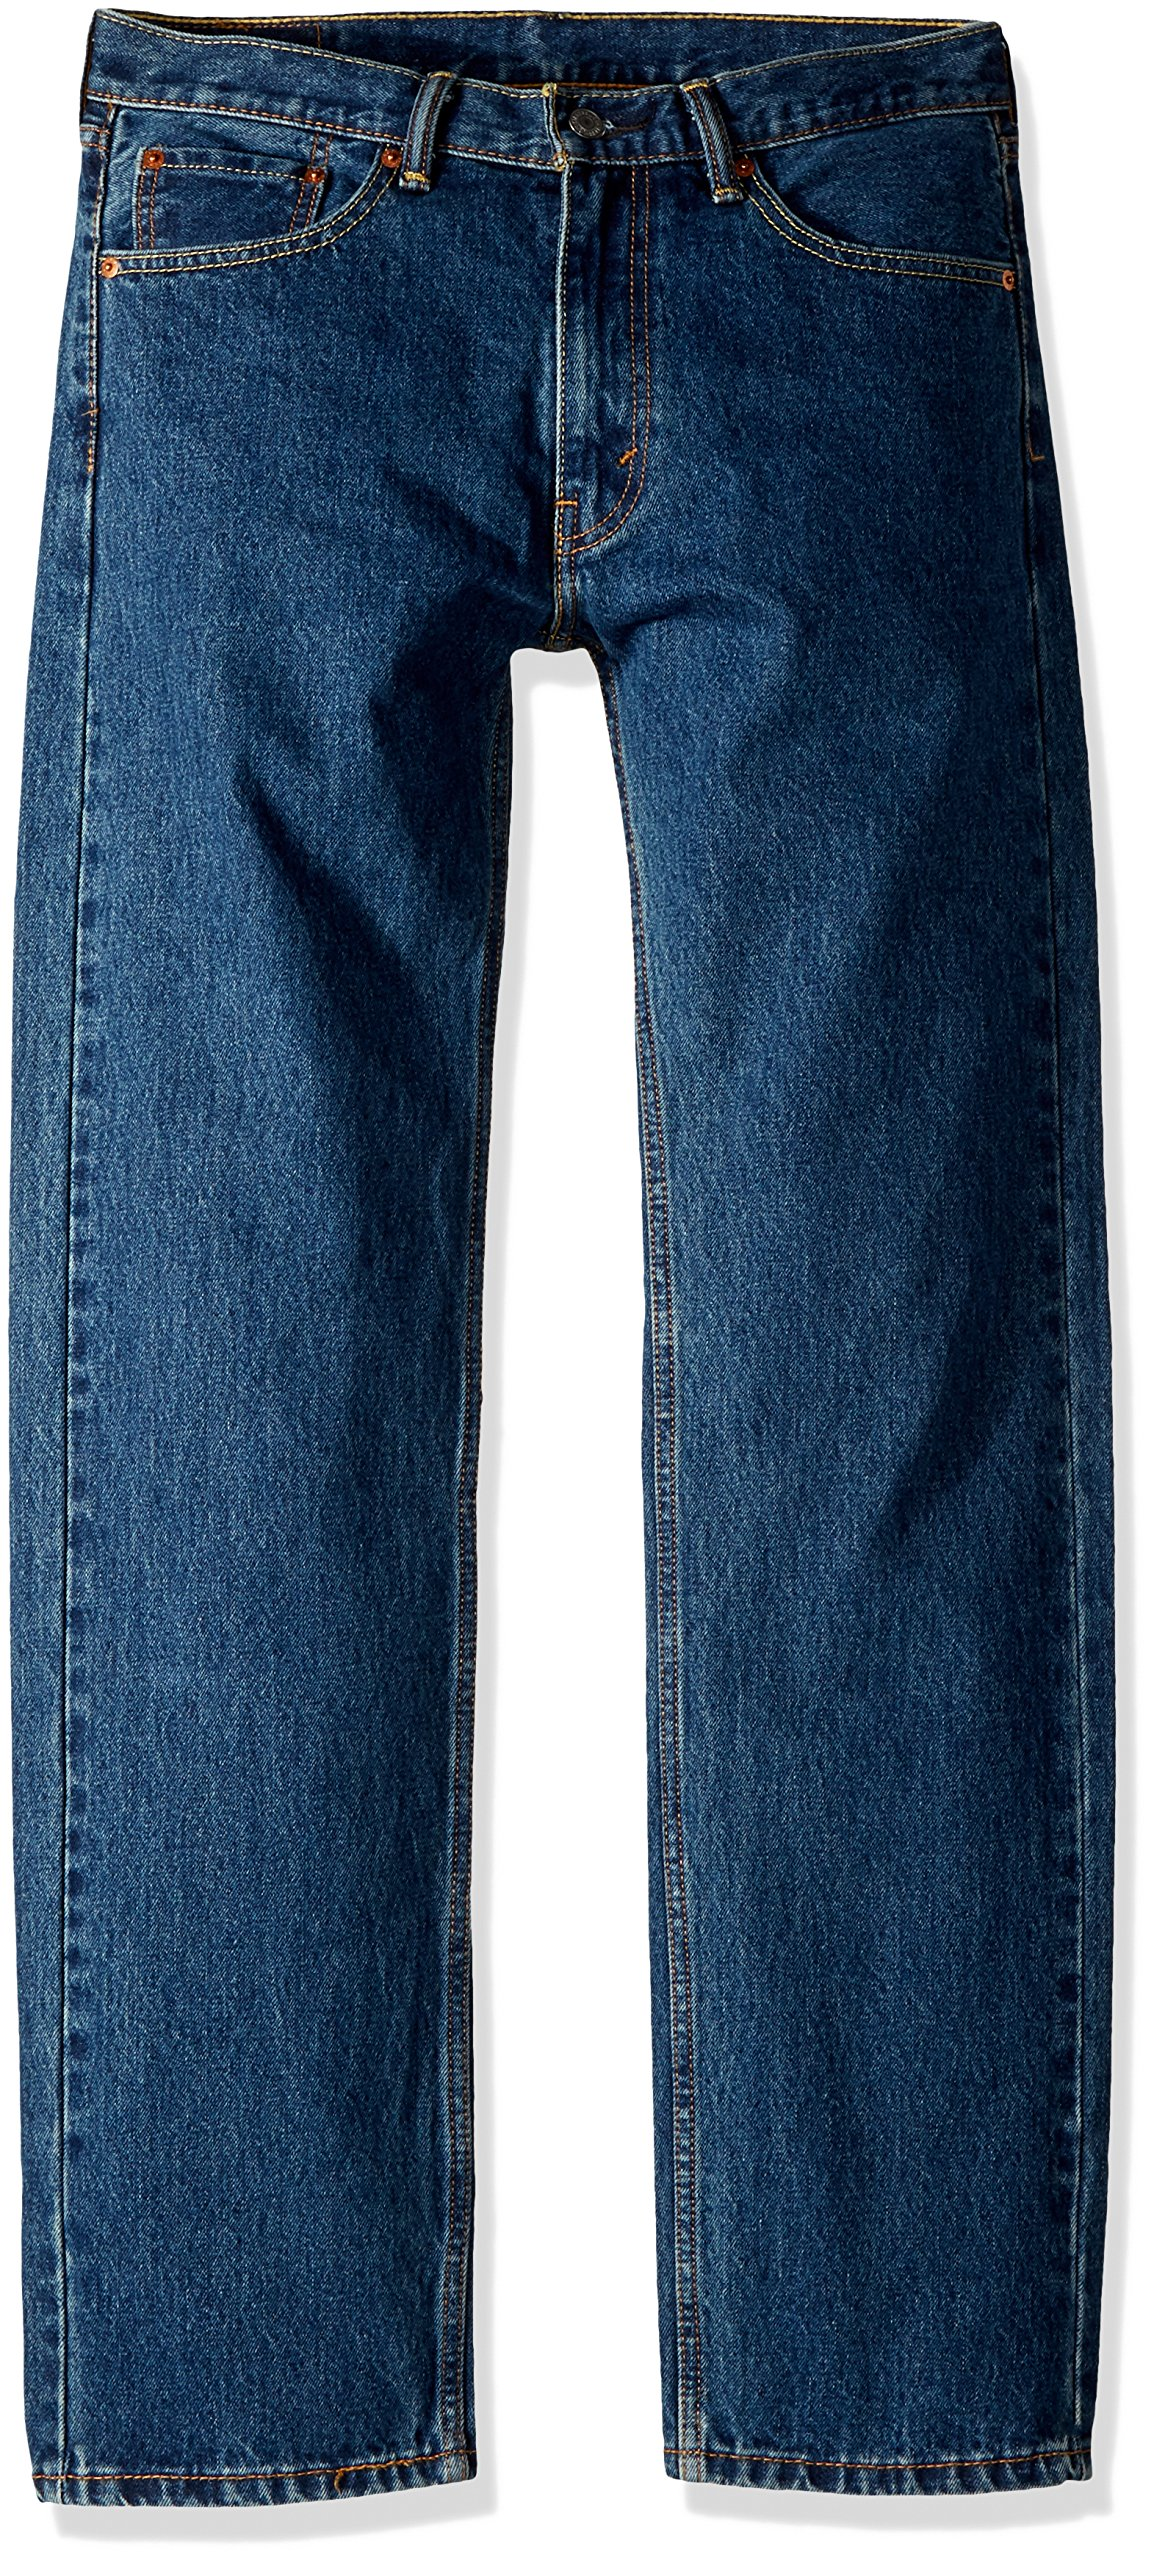 Levi's Men's 505 Regular Fit Jean, Dark Stonewash, 36x32